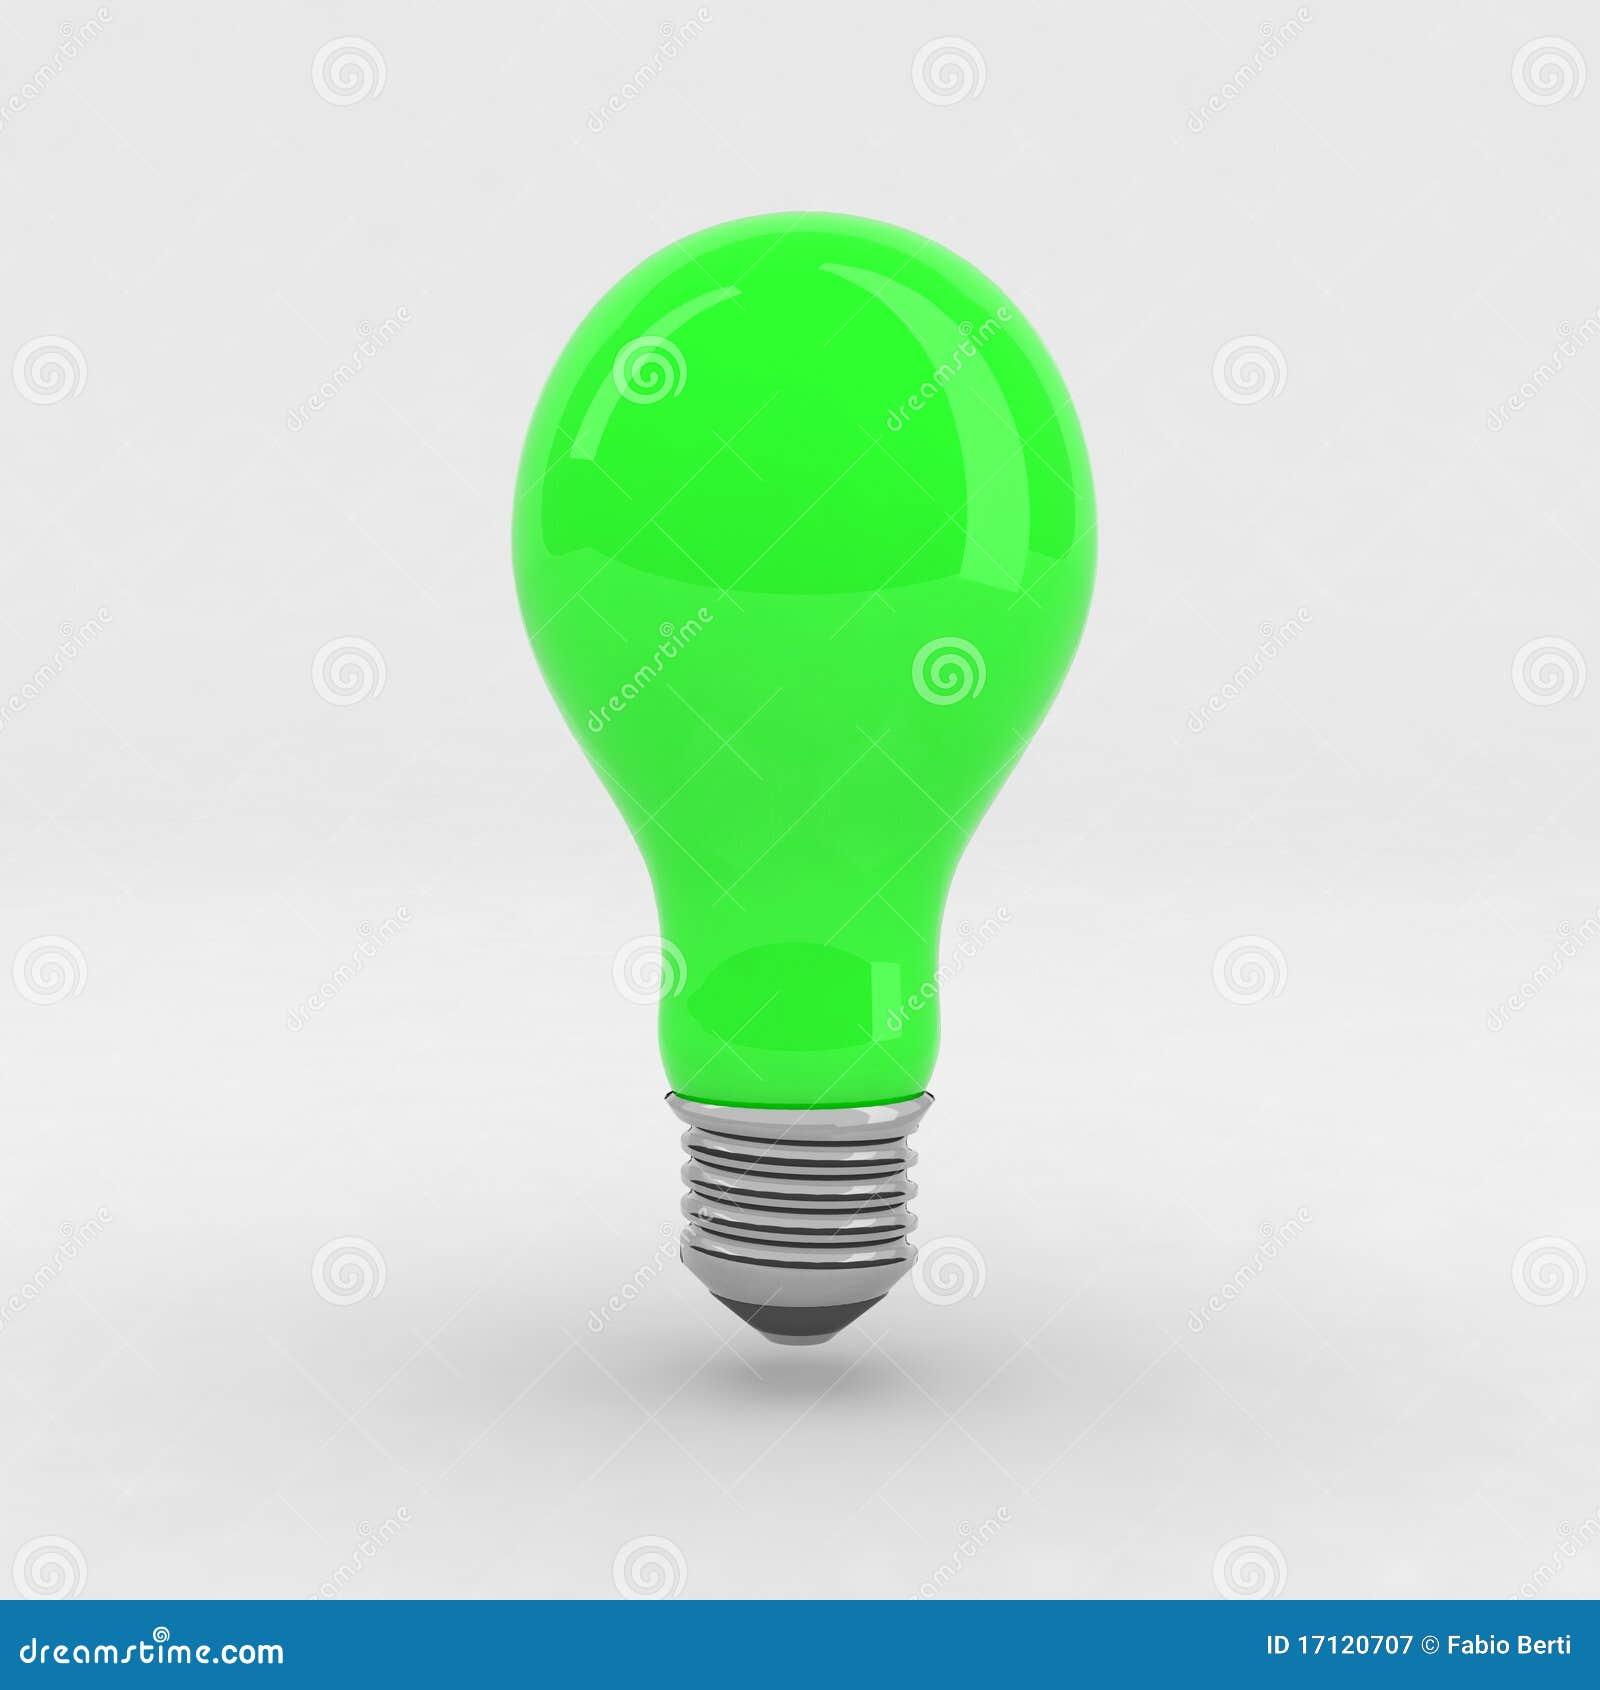 Green Light Bulb Royalty Free Stock Photography Image 17120707